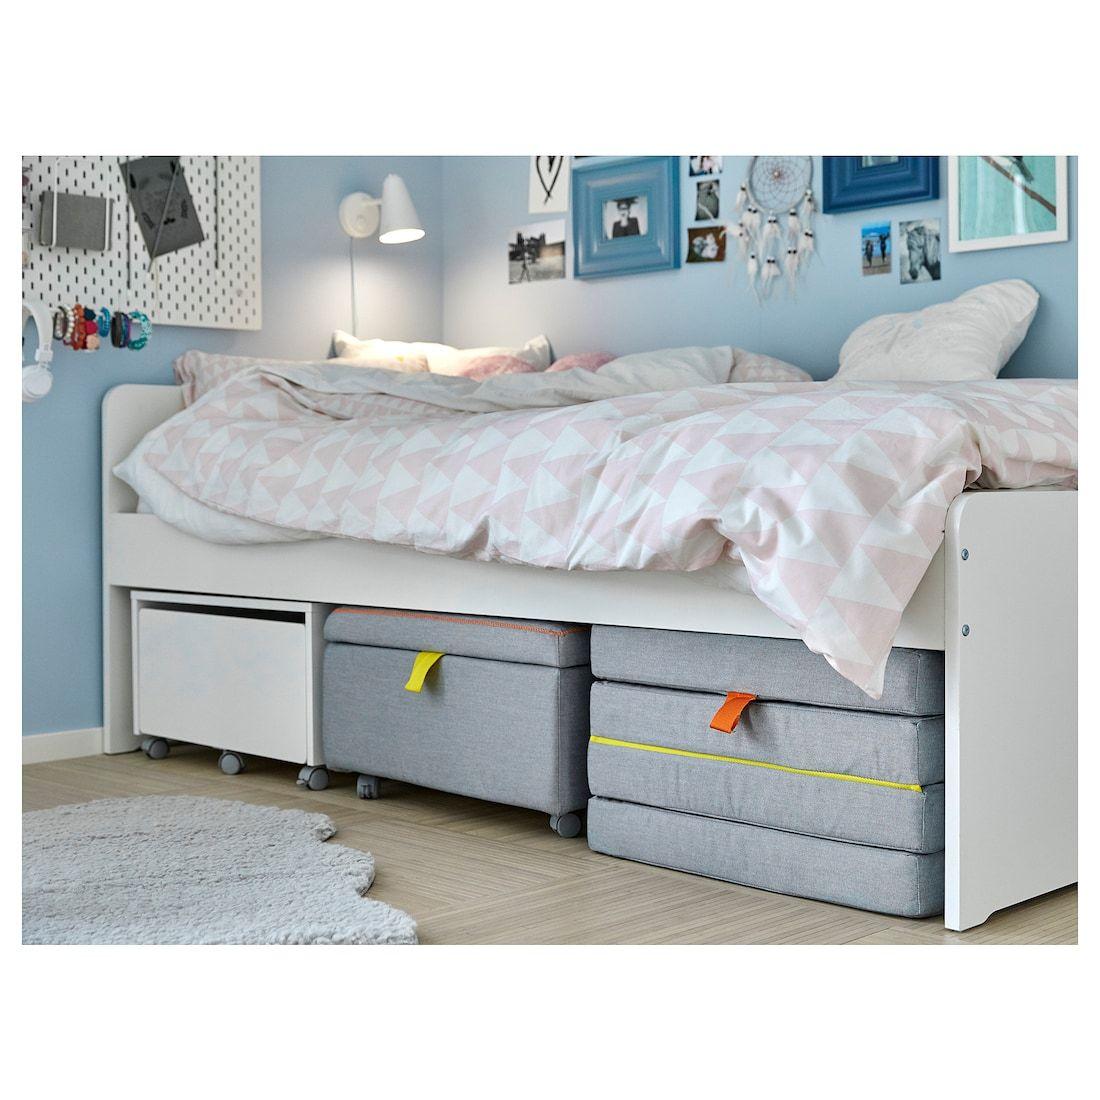 Slakt Mattress Folding Ikea Ikea Ikea Kids Bed Mattress